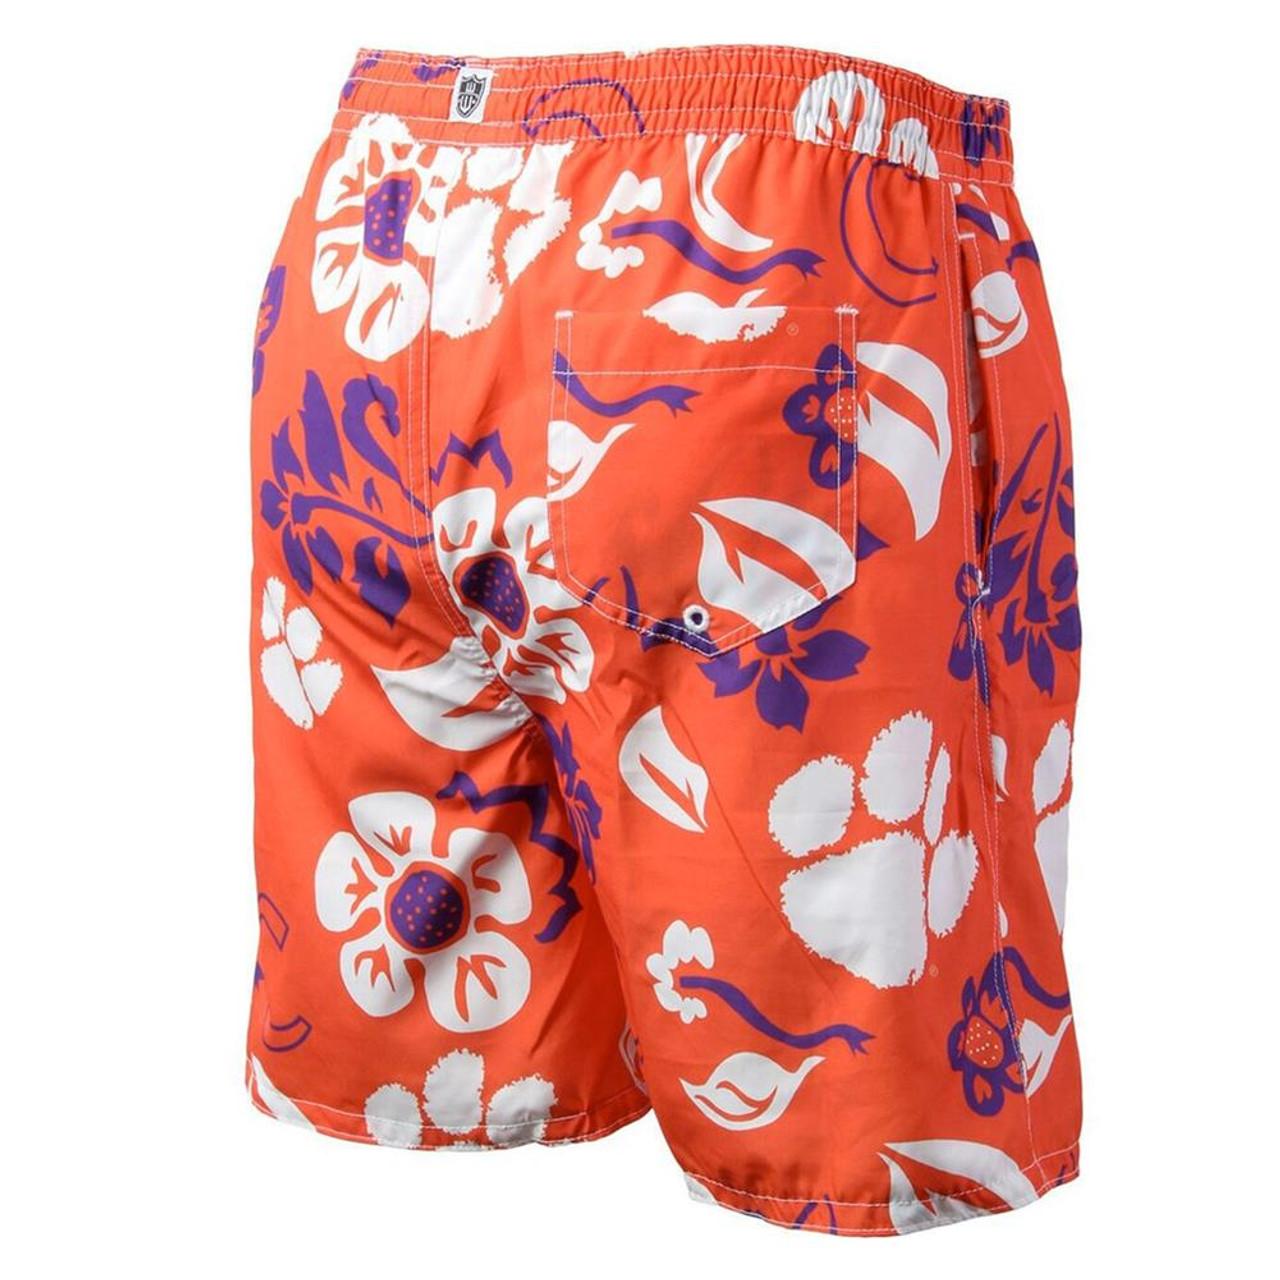 Men's UCF Central Florida Swim Trunks Floral Swim Shorts